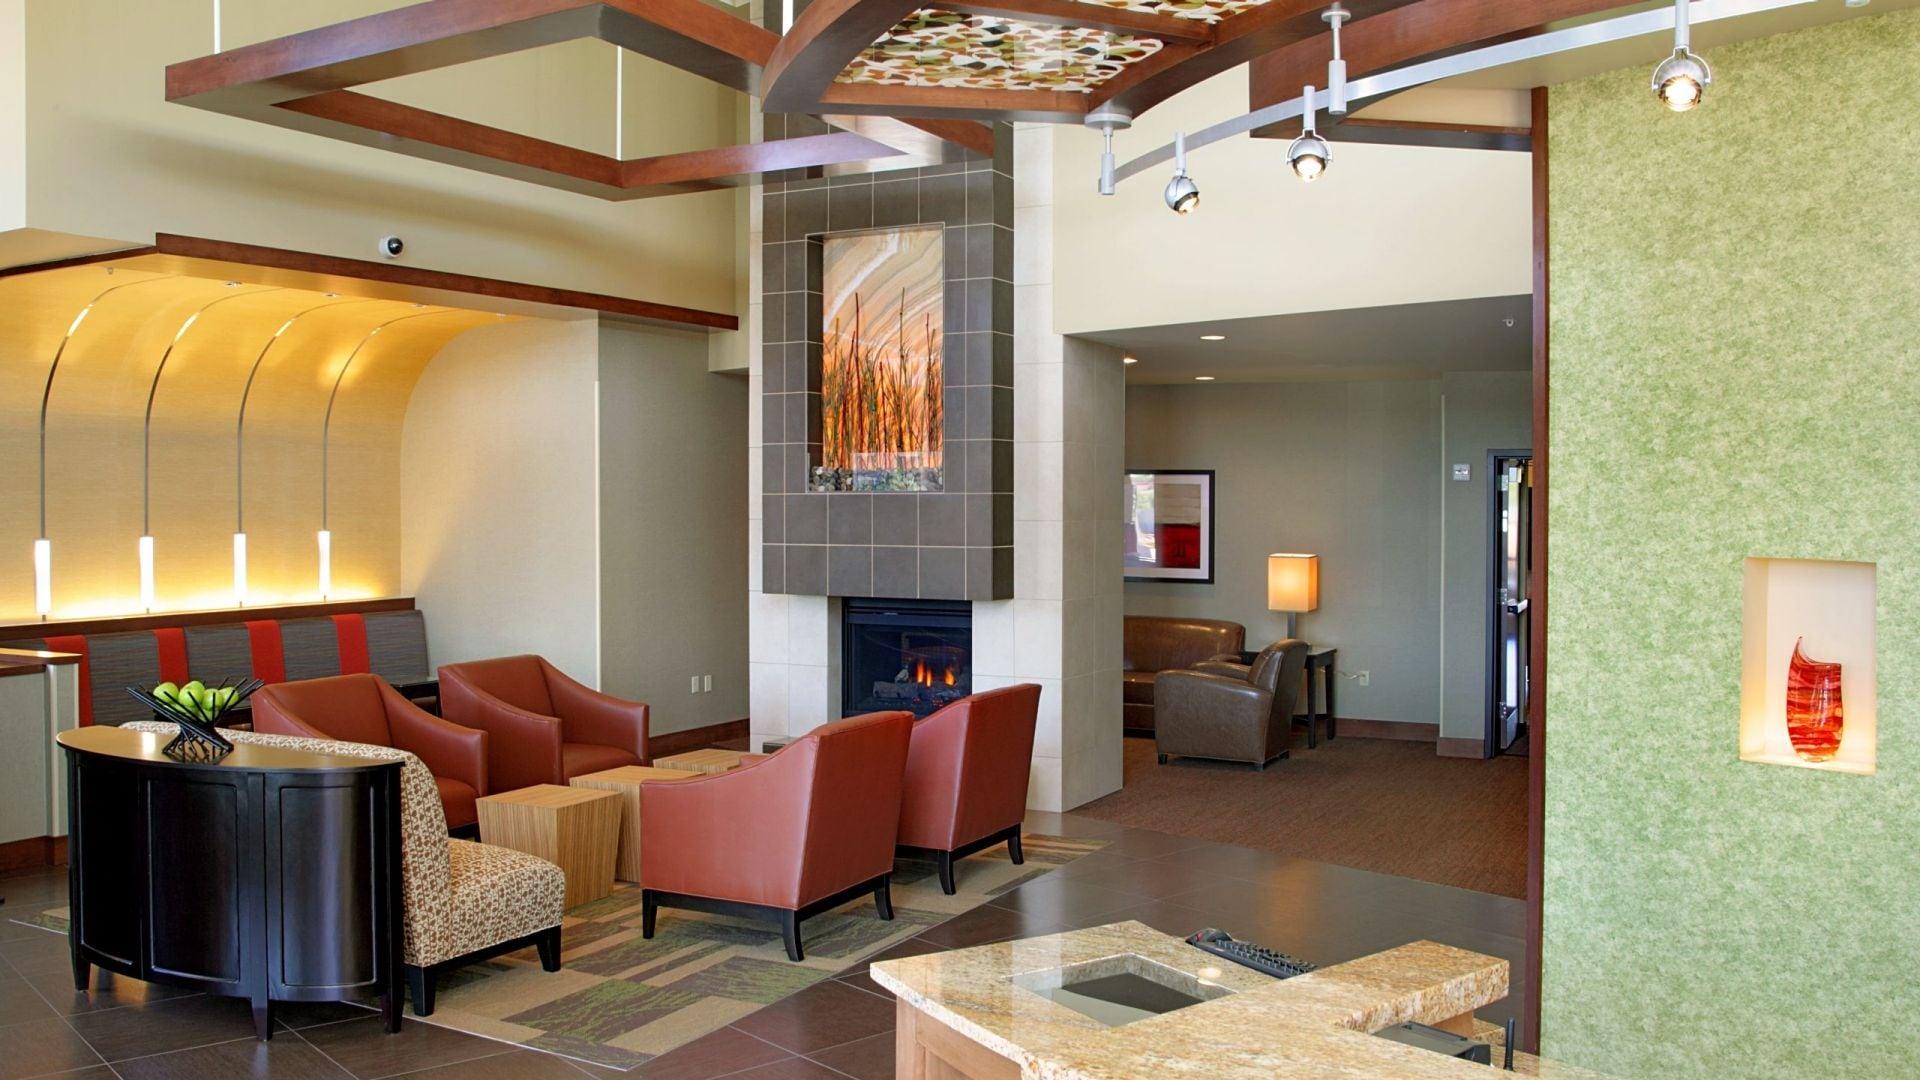 Hyatt Place Phoenix / Mesa lobby lounge area